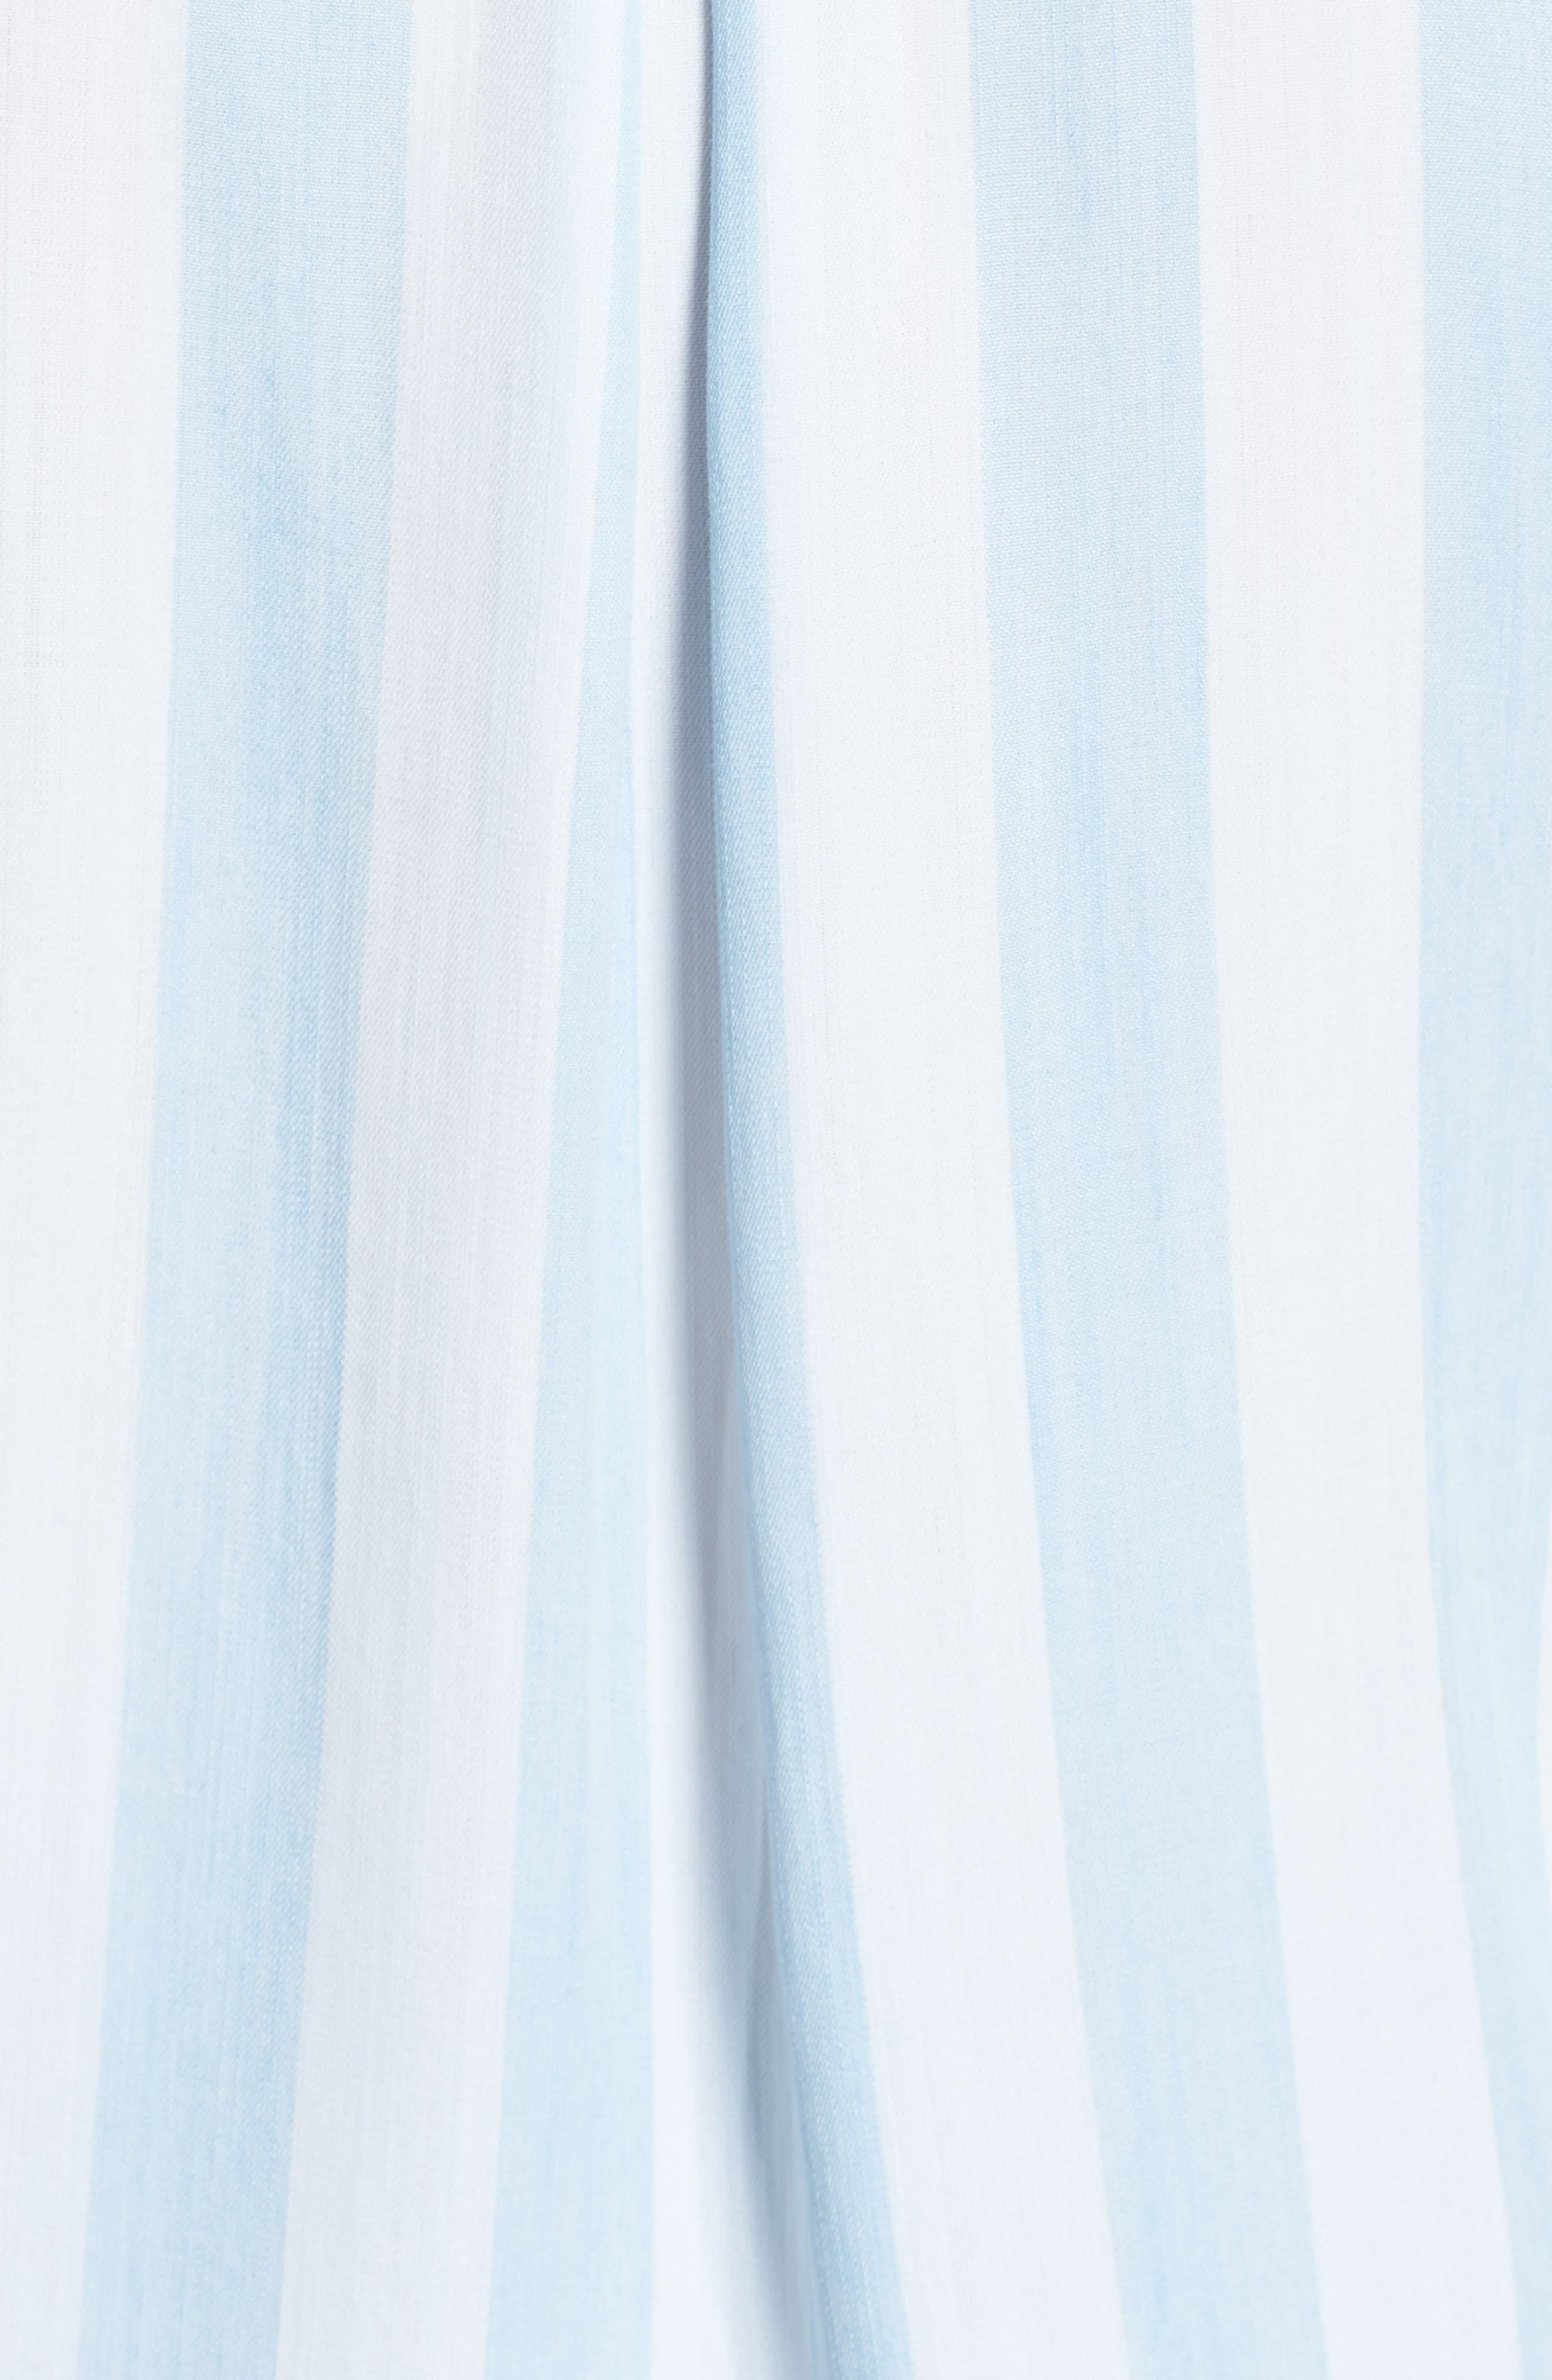 Uli Lace-Up Top,                             Alternate thumbnail 5, color,                             152